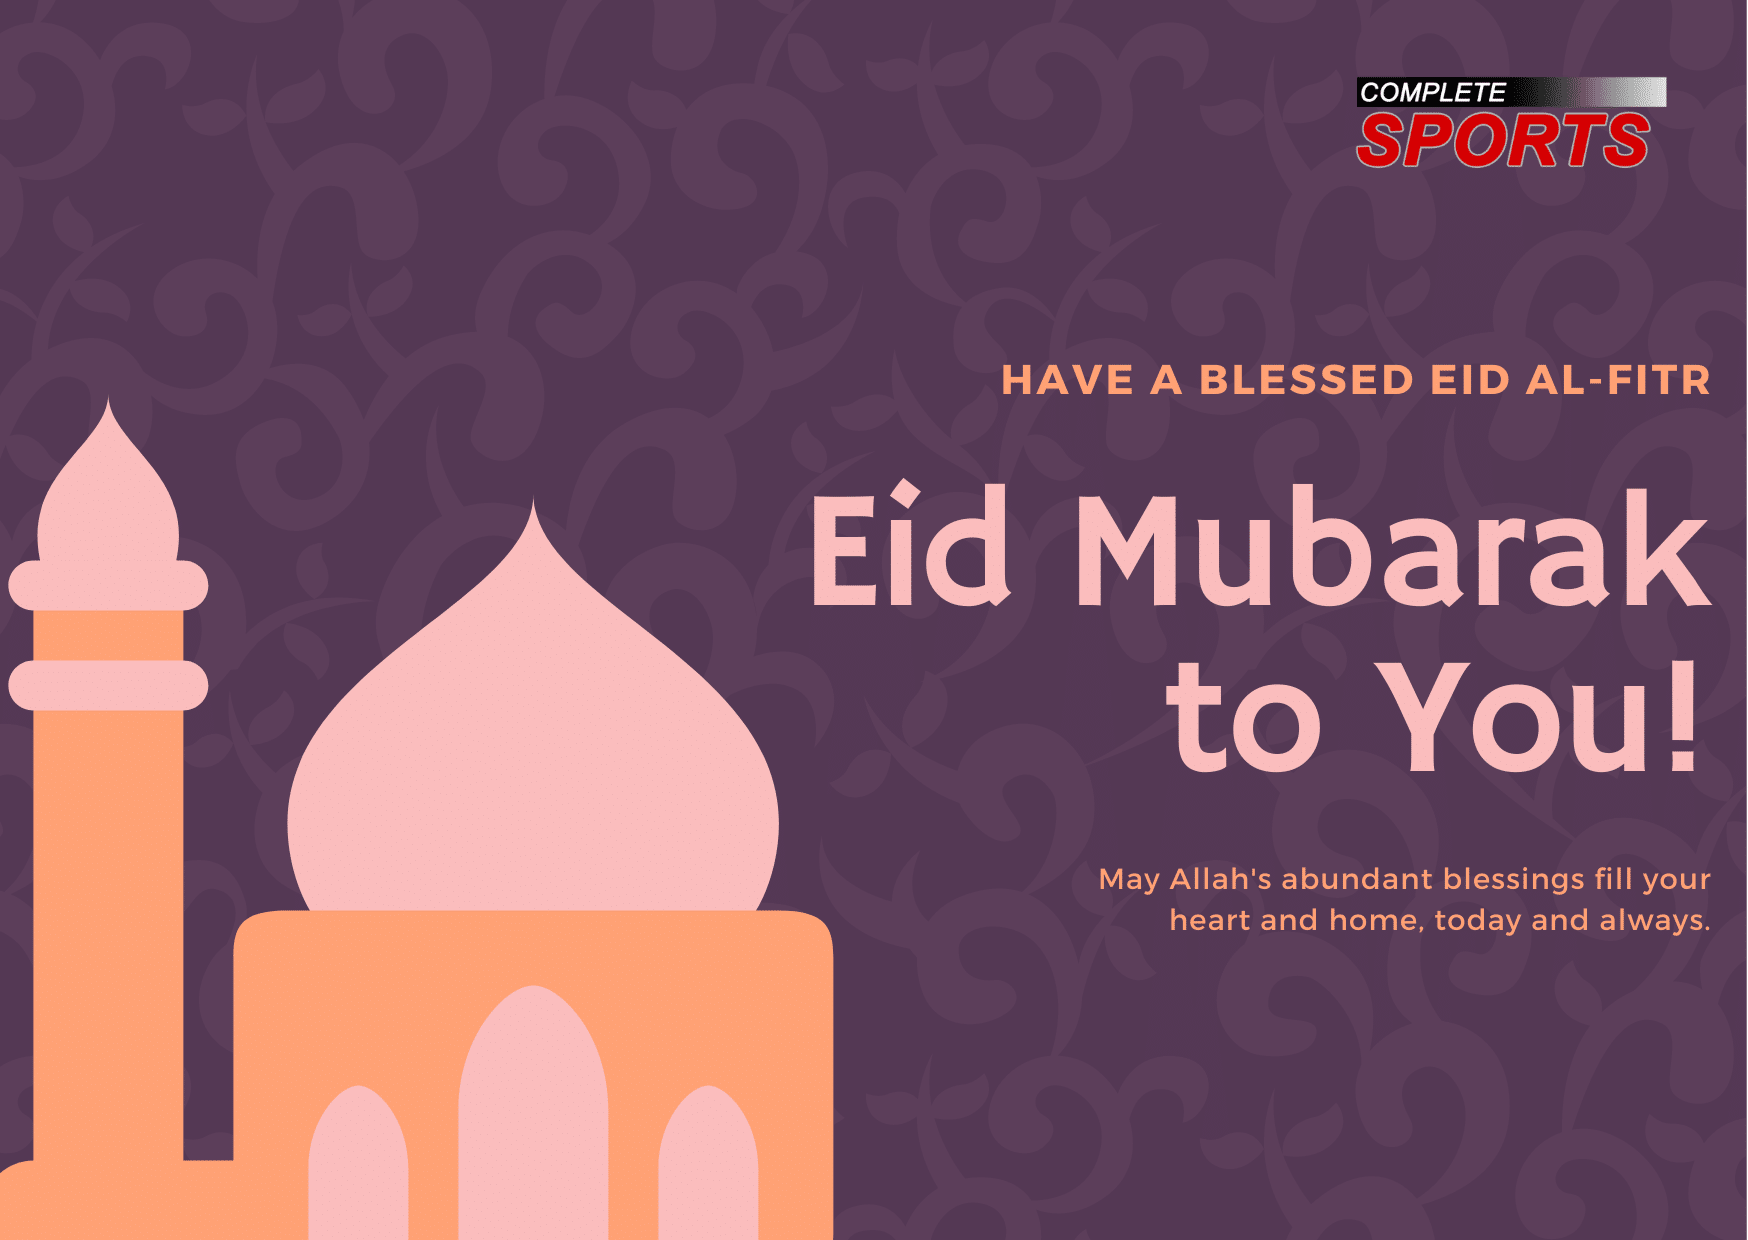 Happy Eid El Kabir From Complete Sports